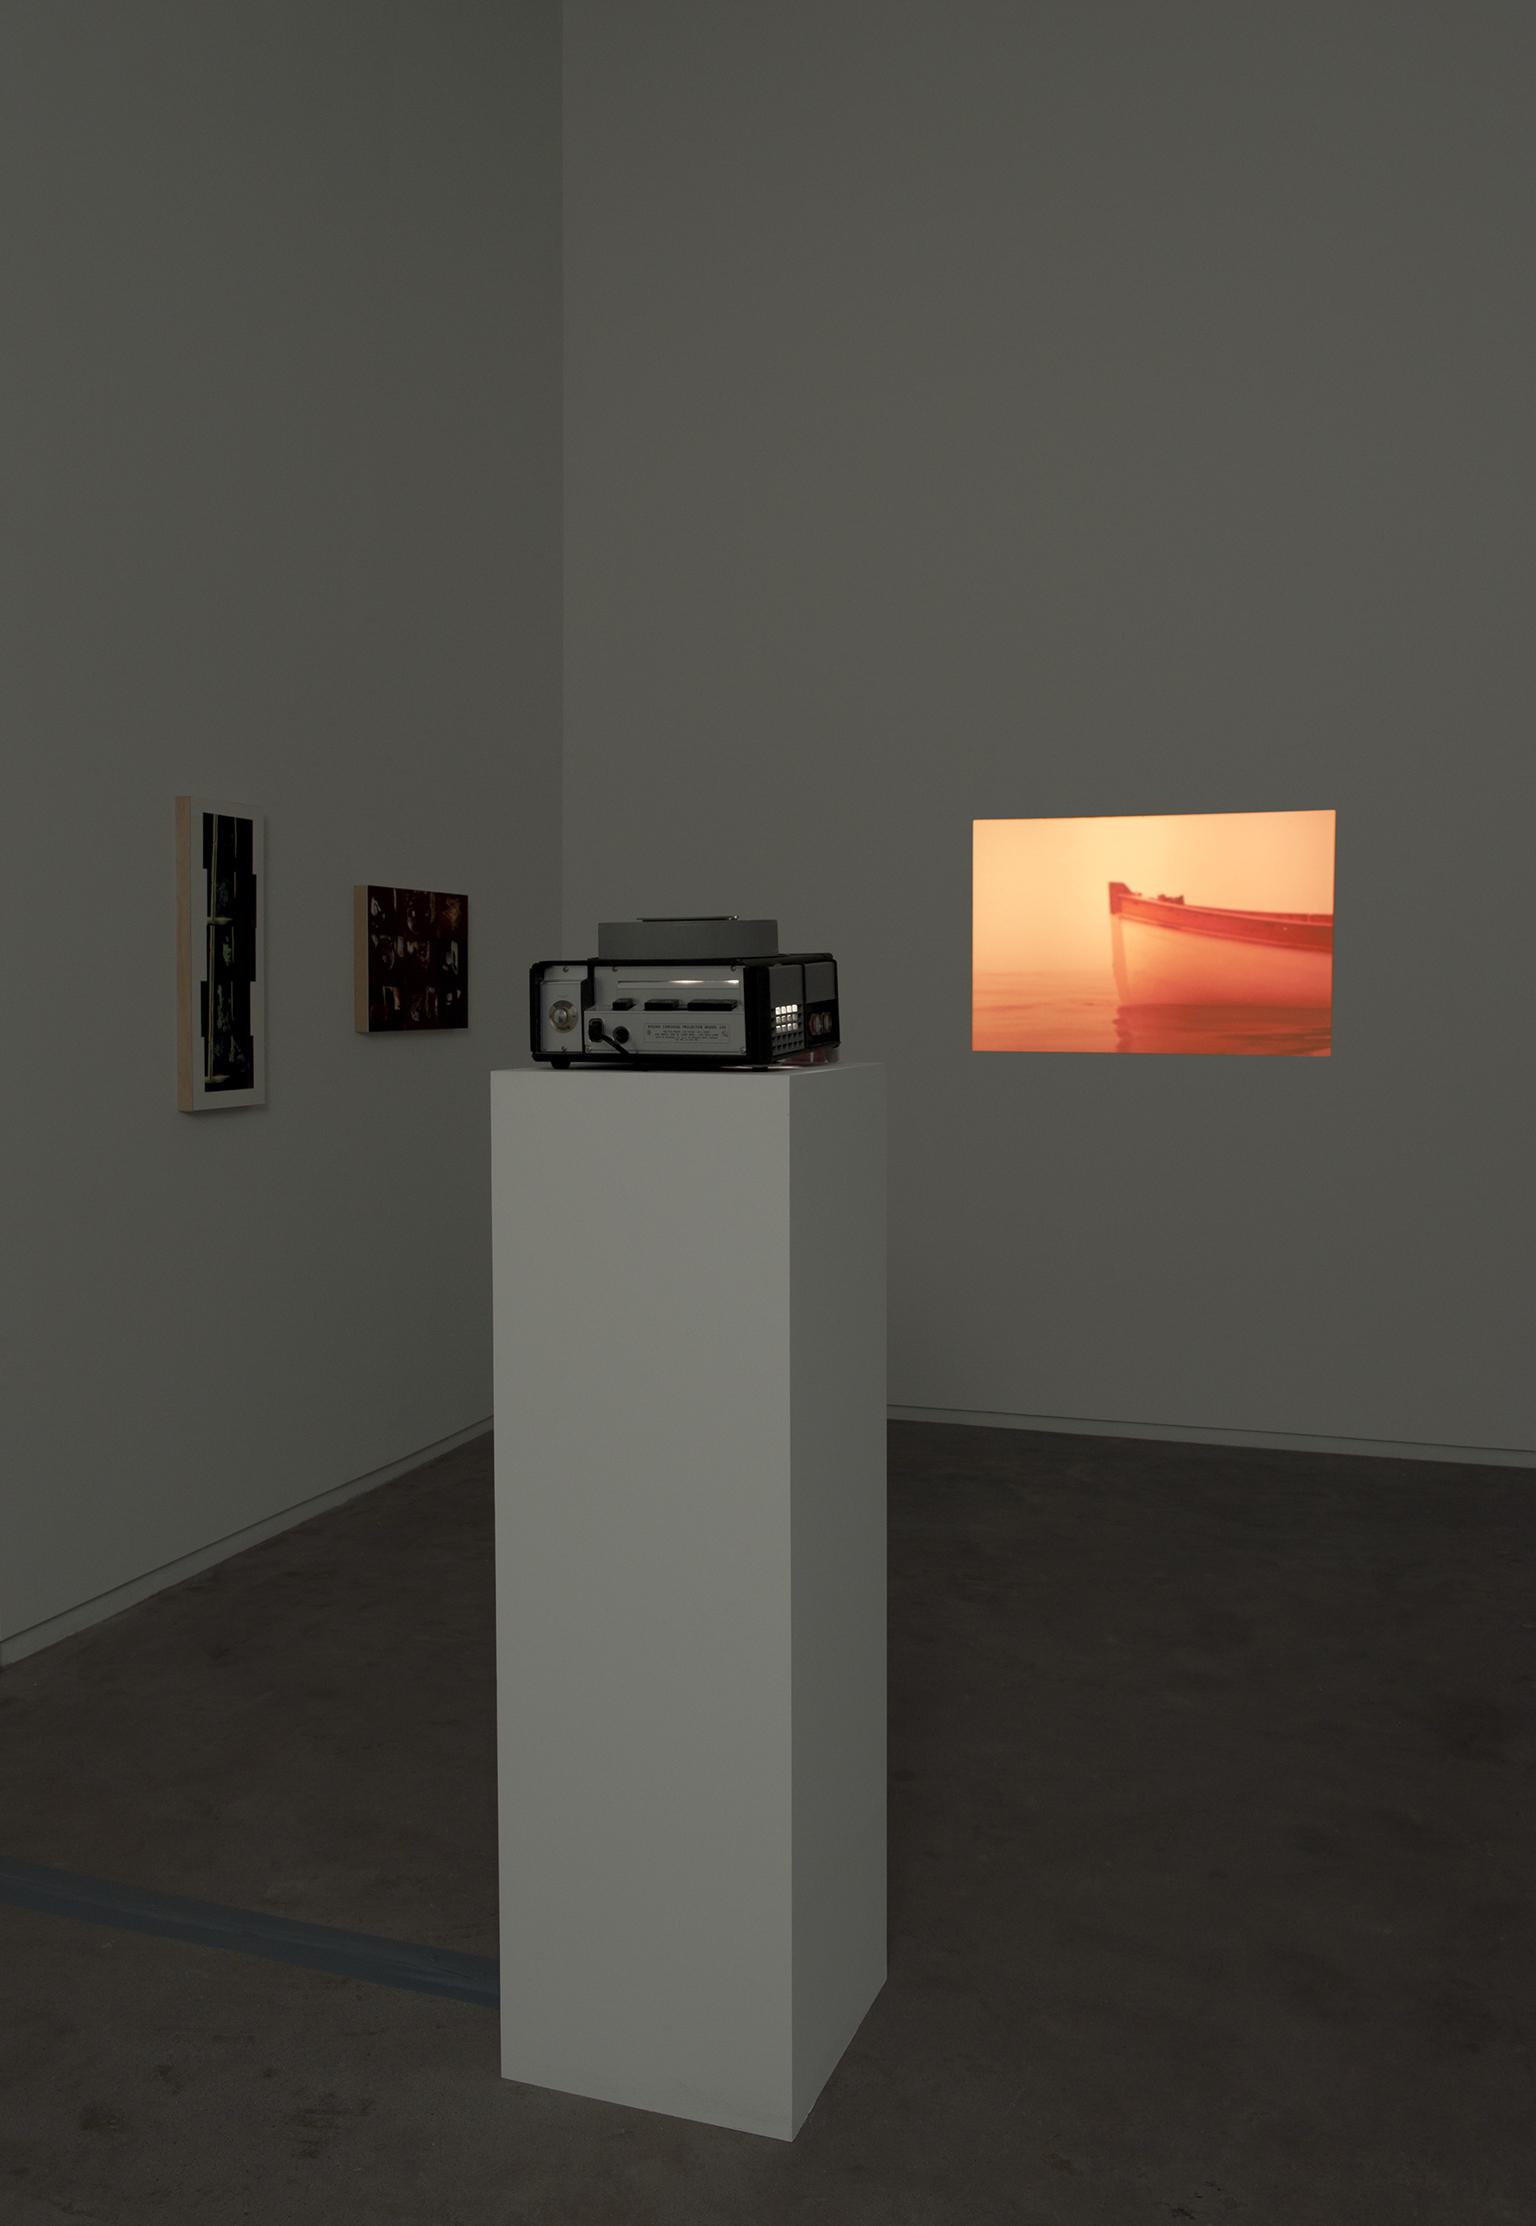 Robert Kleyn, Dreaming Drowning, 1977, 35mm slide projector for 80 slide carousel   by